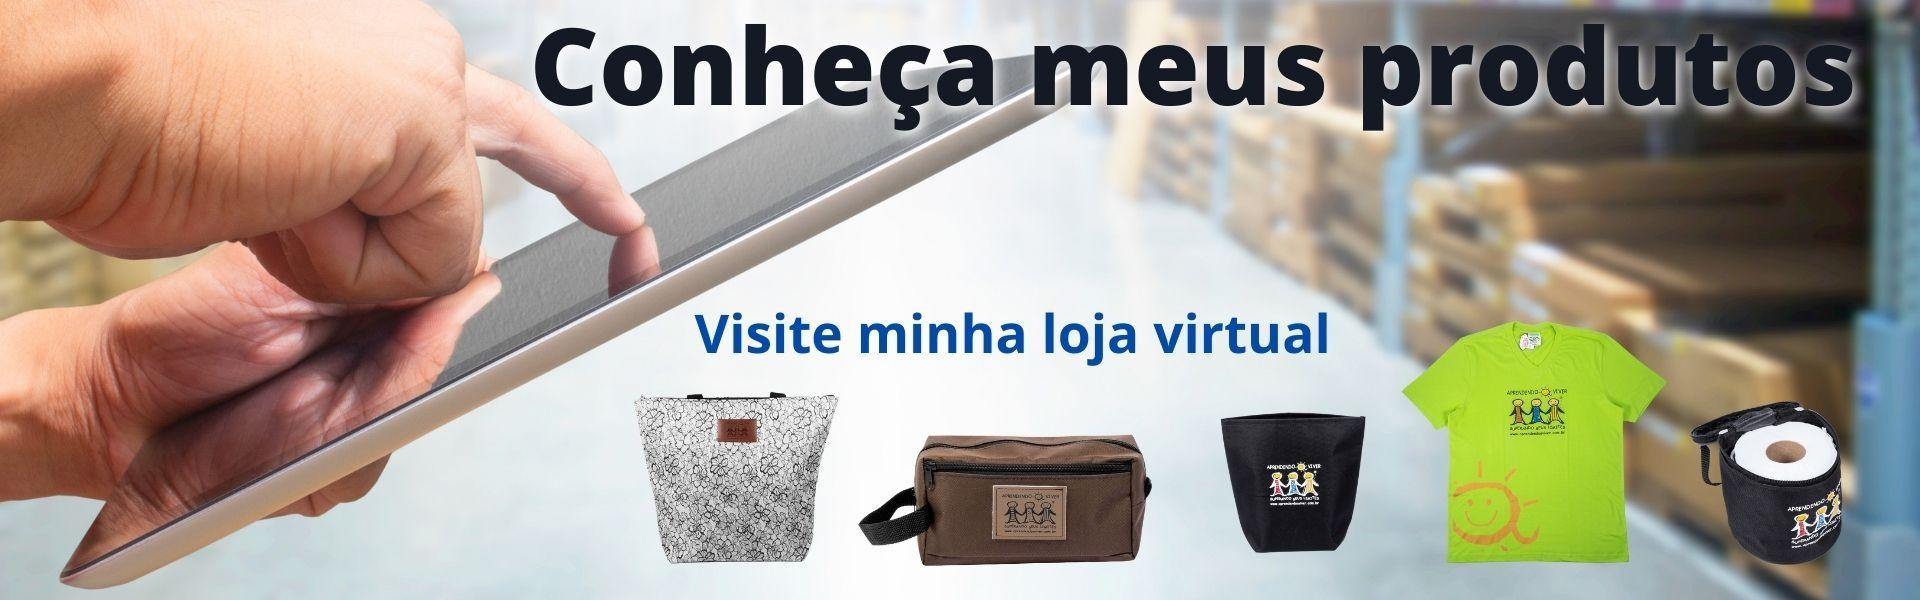 Conheça minha loja virtual